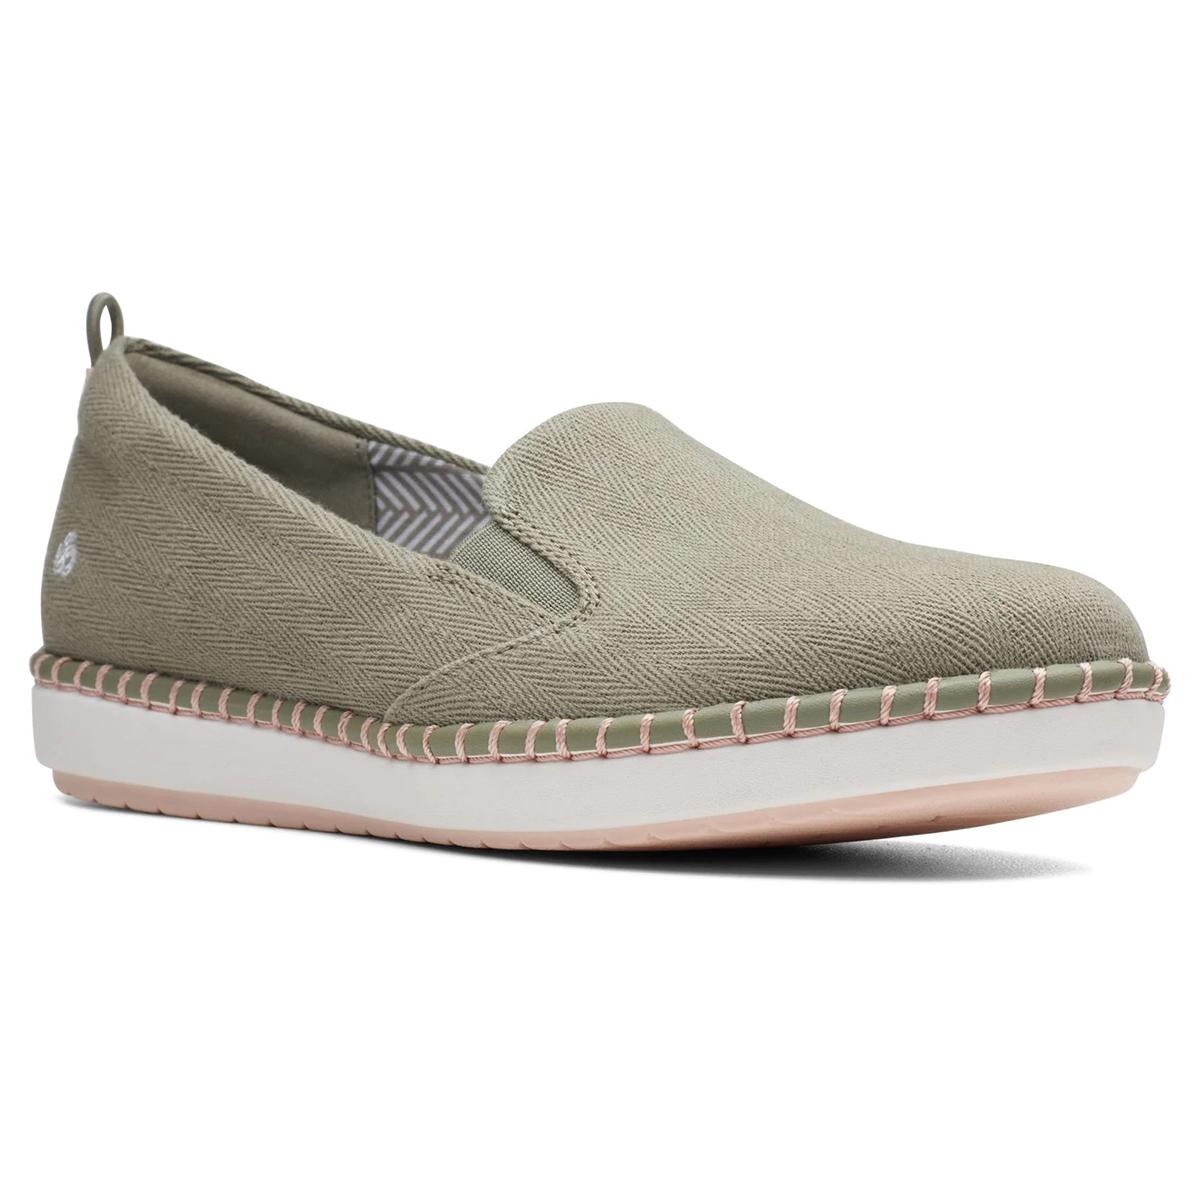 Clarks Women's Cloudstepper Step Glow Slip-On Shoes - Green, 6